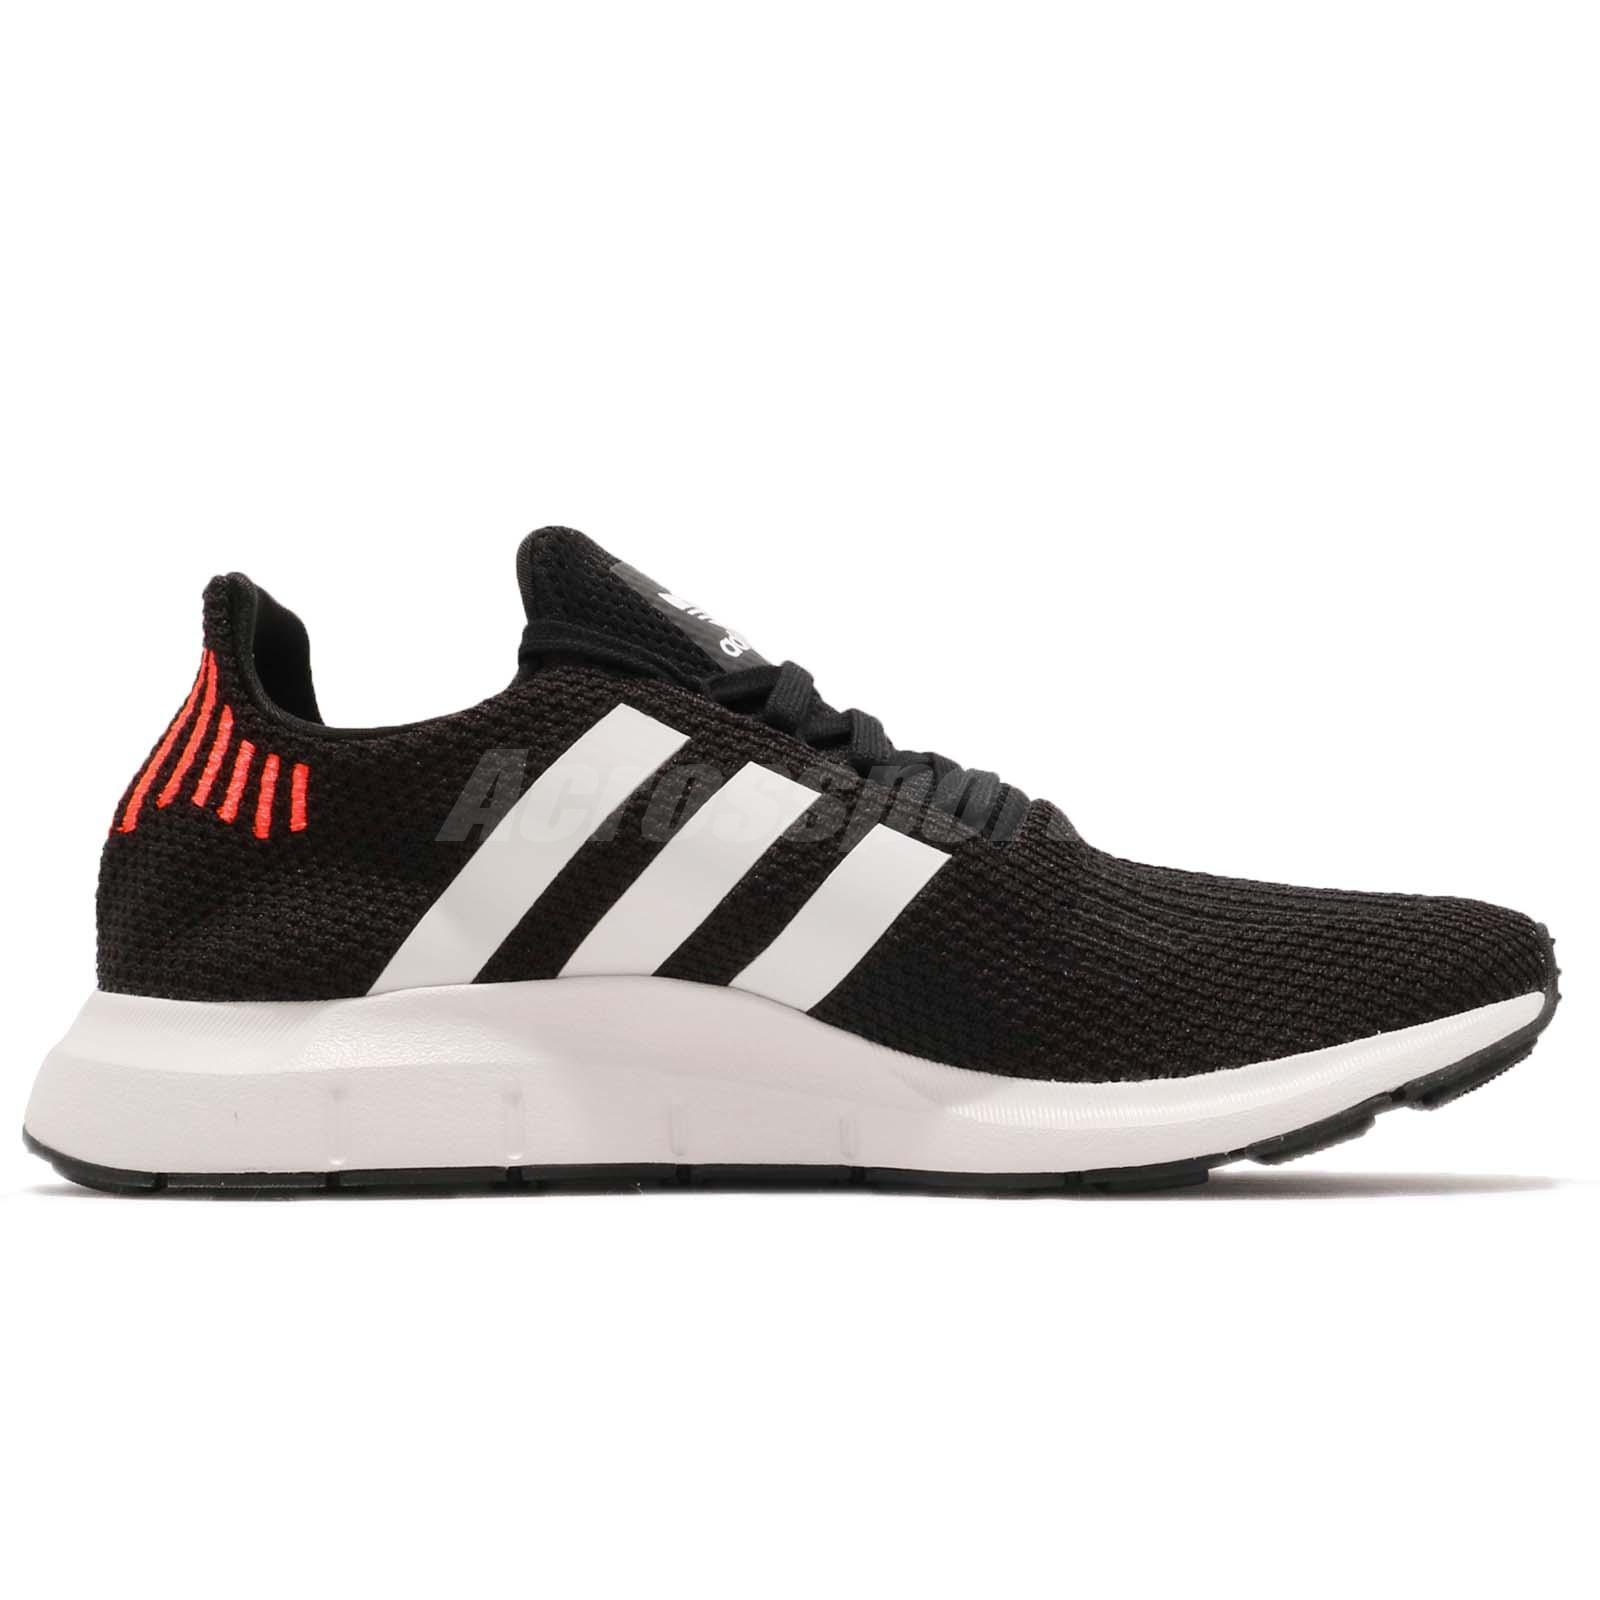 cd255abbbecde adidas Originals Swift Run Black White Men Running Training Shoes ...